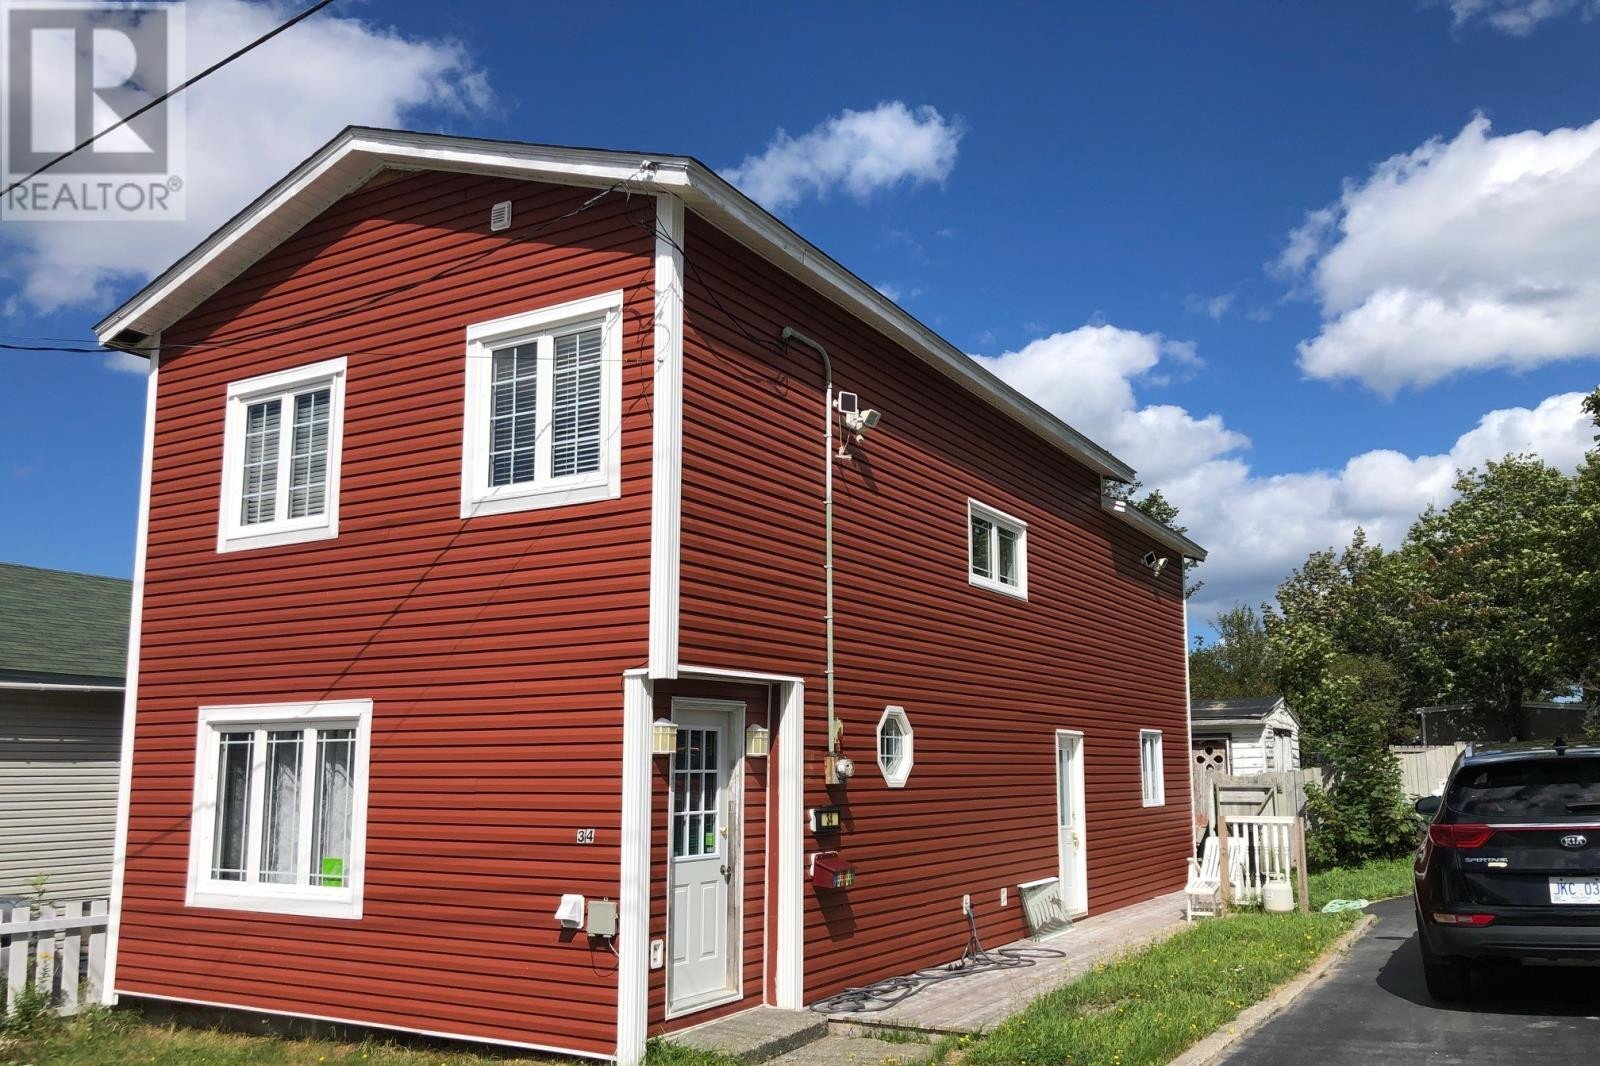 House for sale at 34 Suez St St. Johns Newfoundland - MLS: 1221494